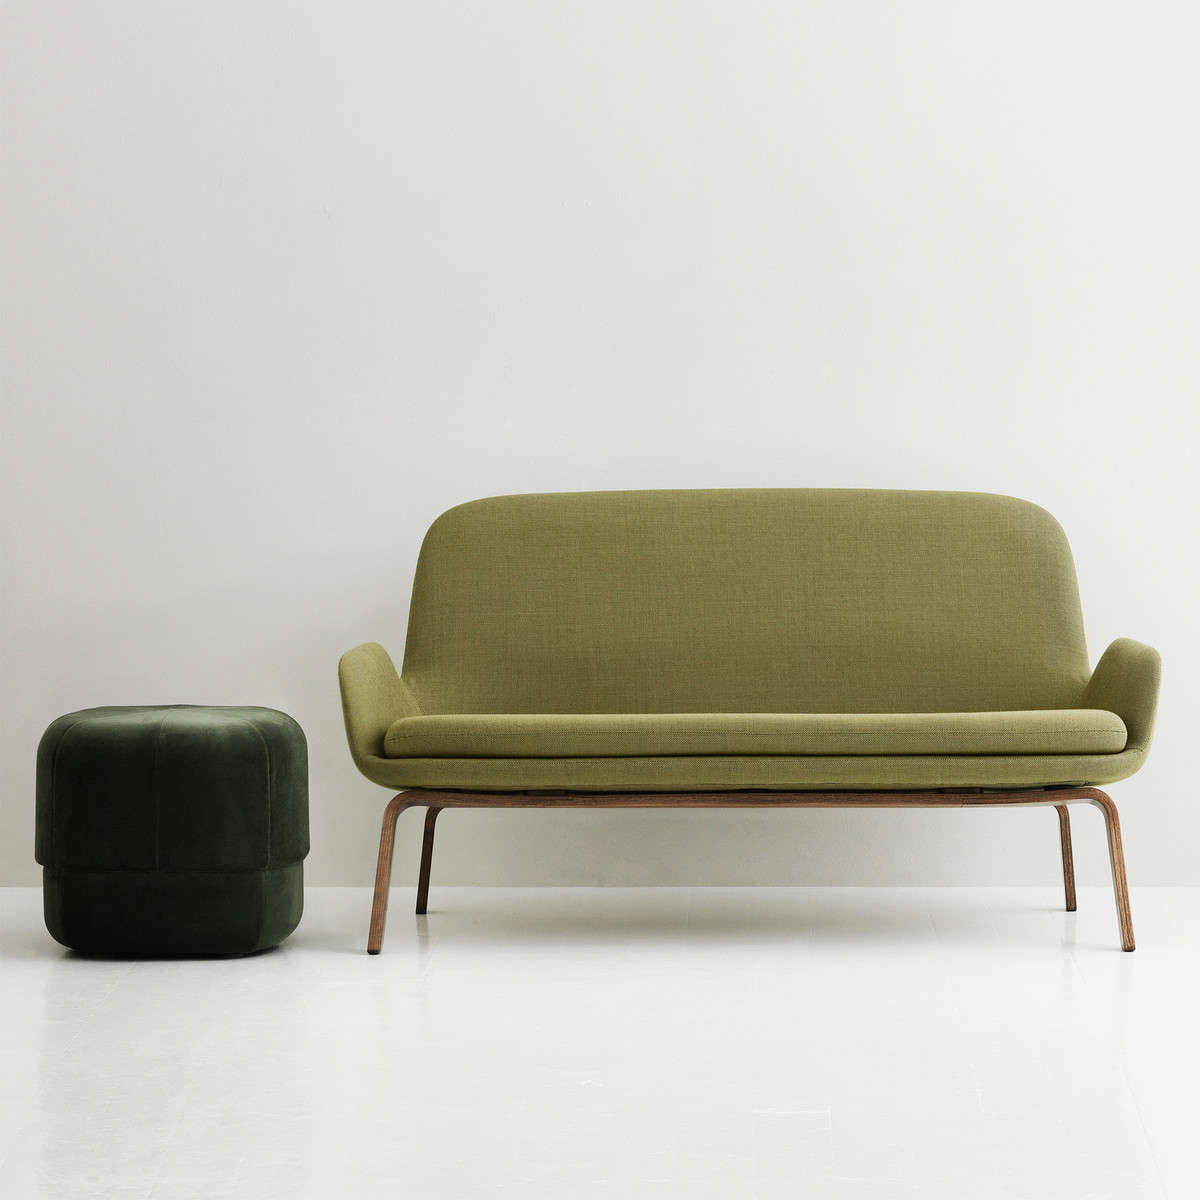 normann copenhagen sofa era italsofa baia mare 10 easy pieces the new nordic remodelista